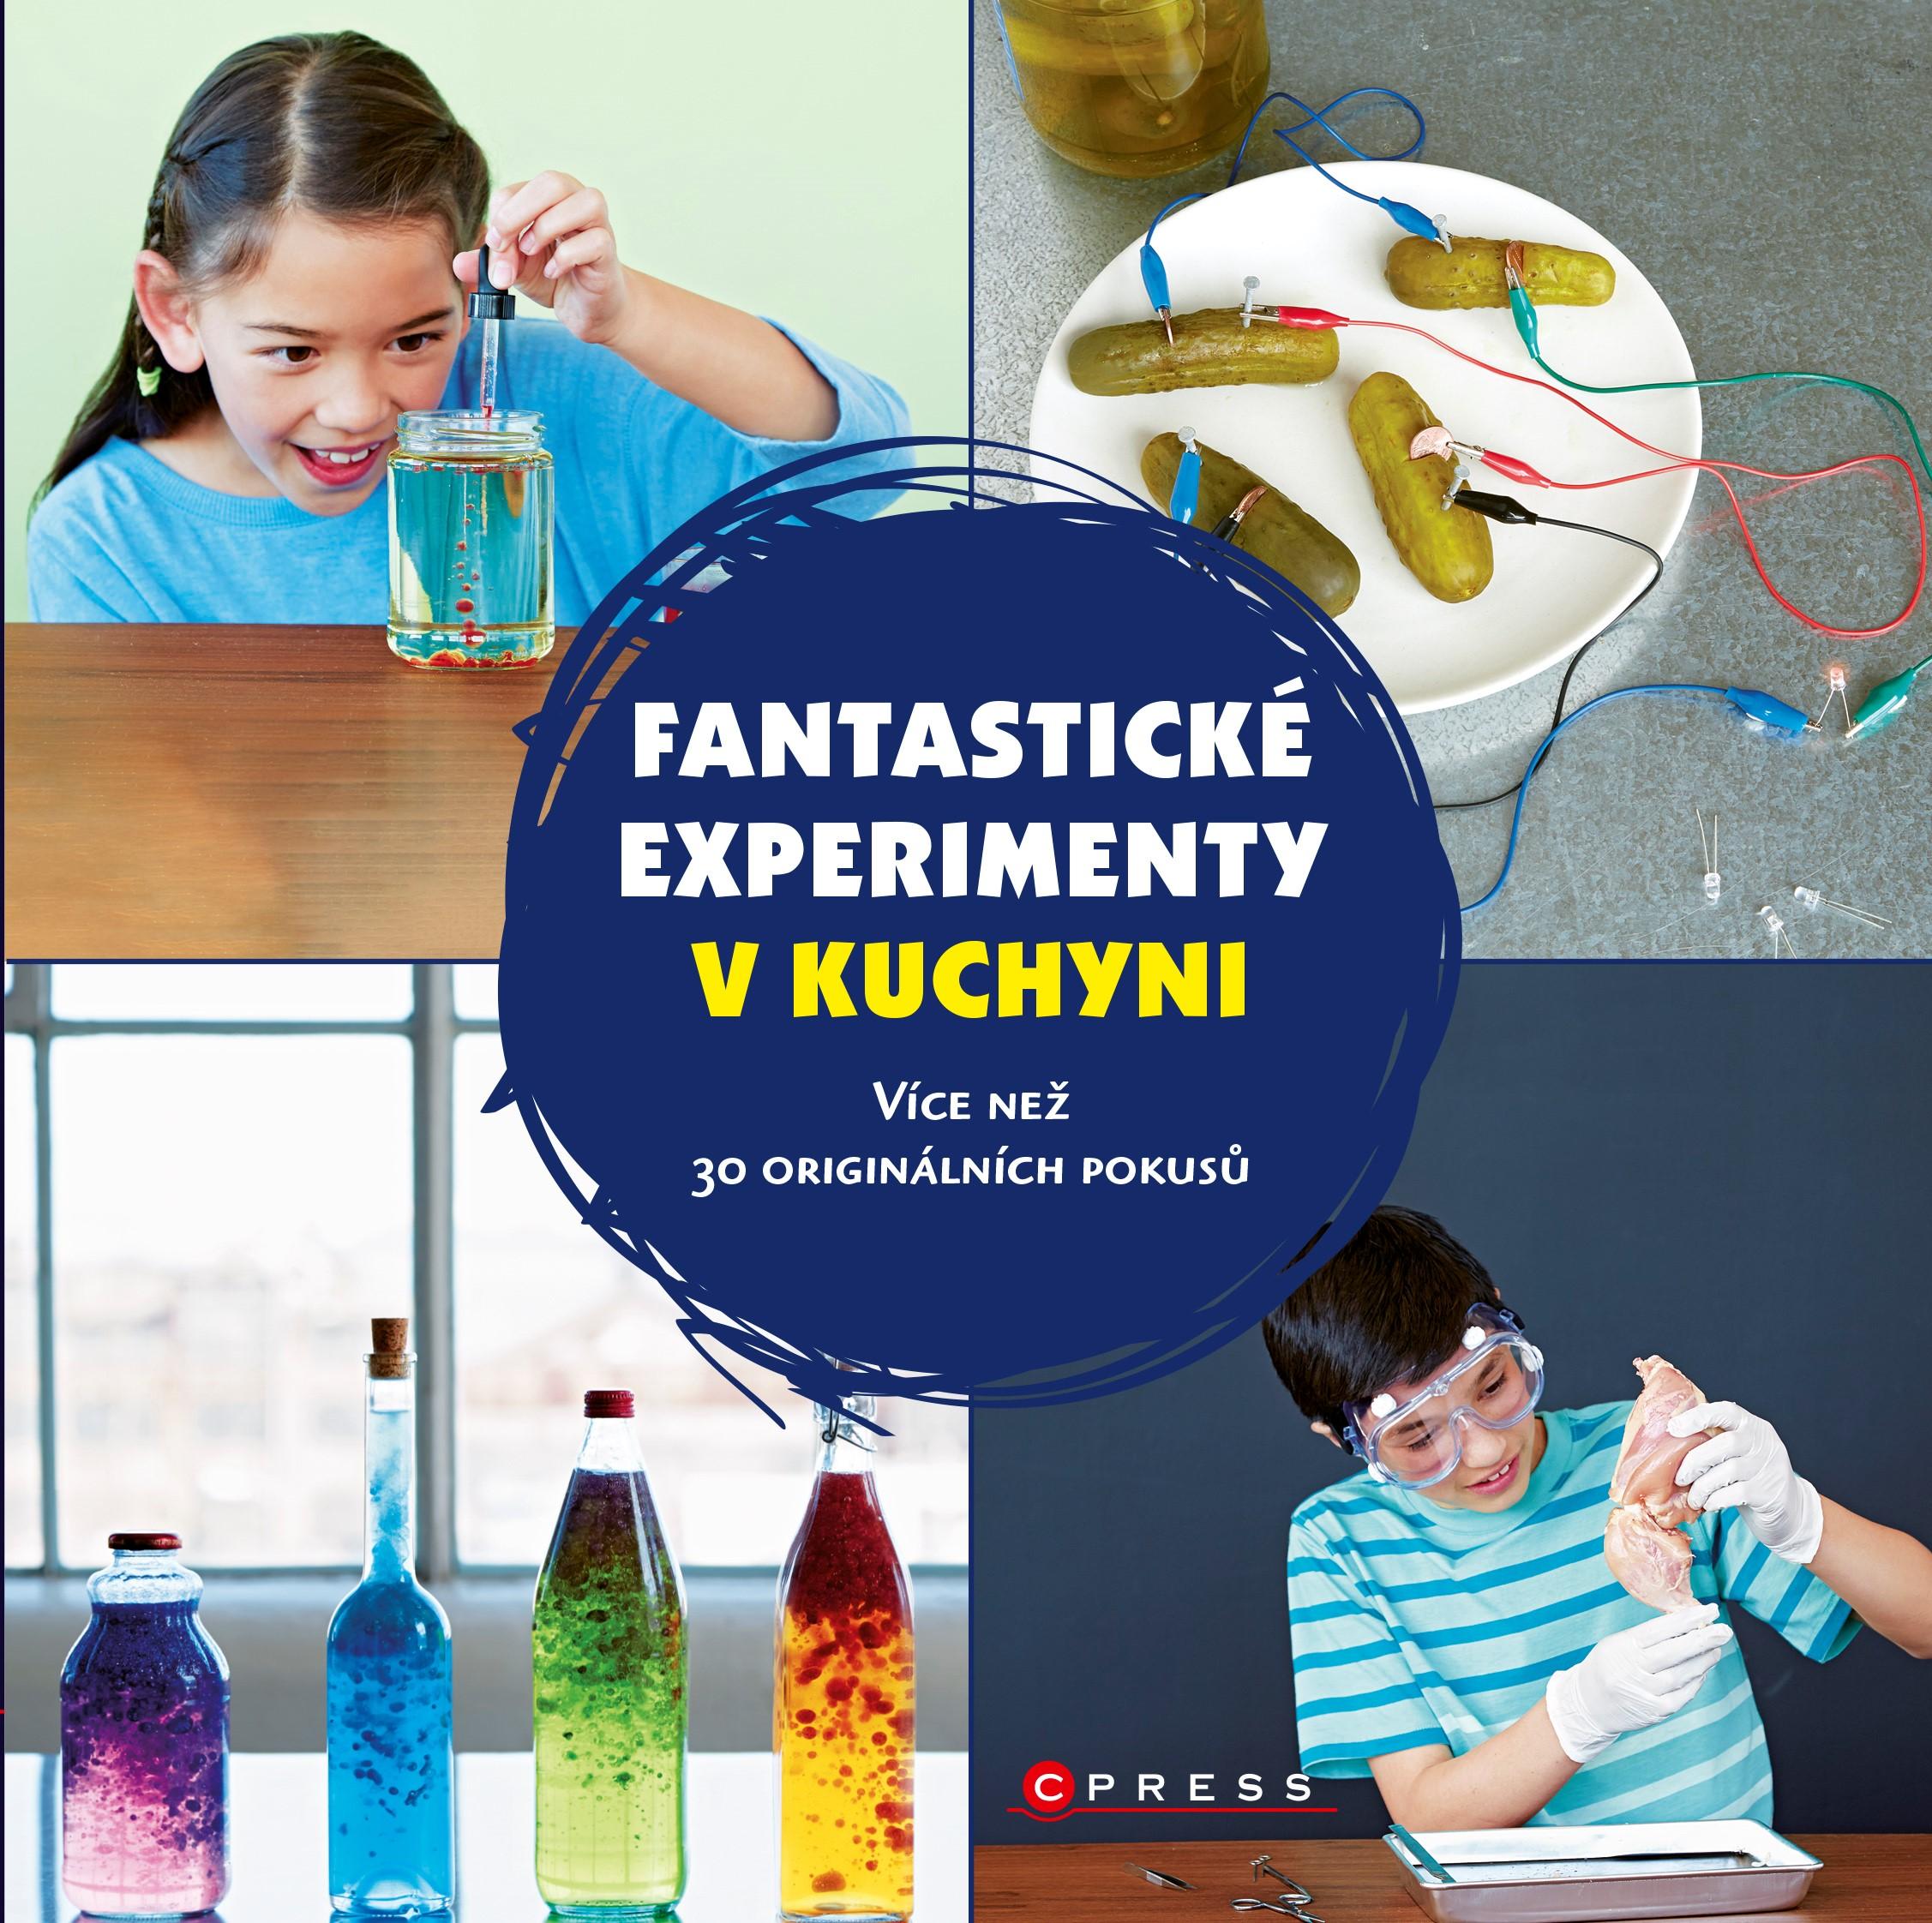 Fantastické experimenty v kuchyni | The Exploratorium